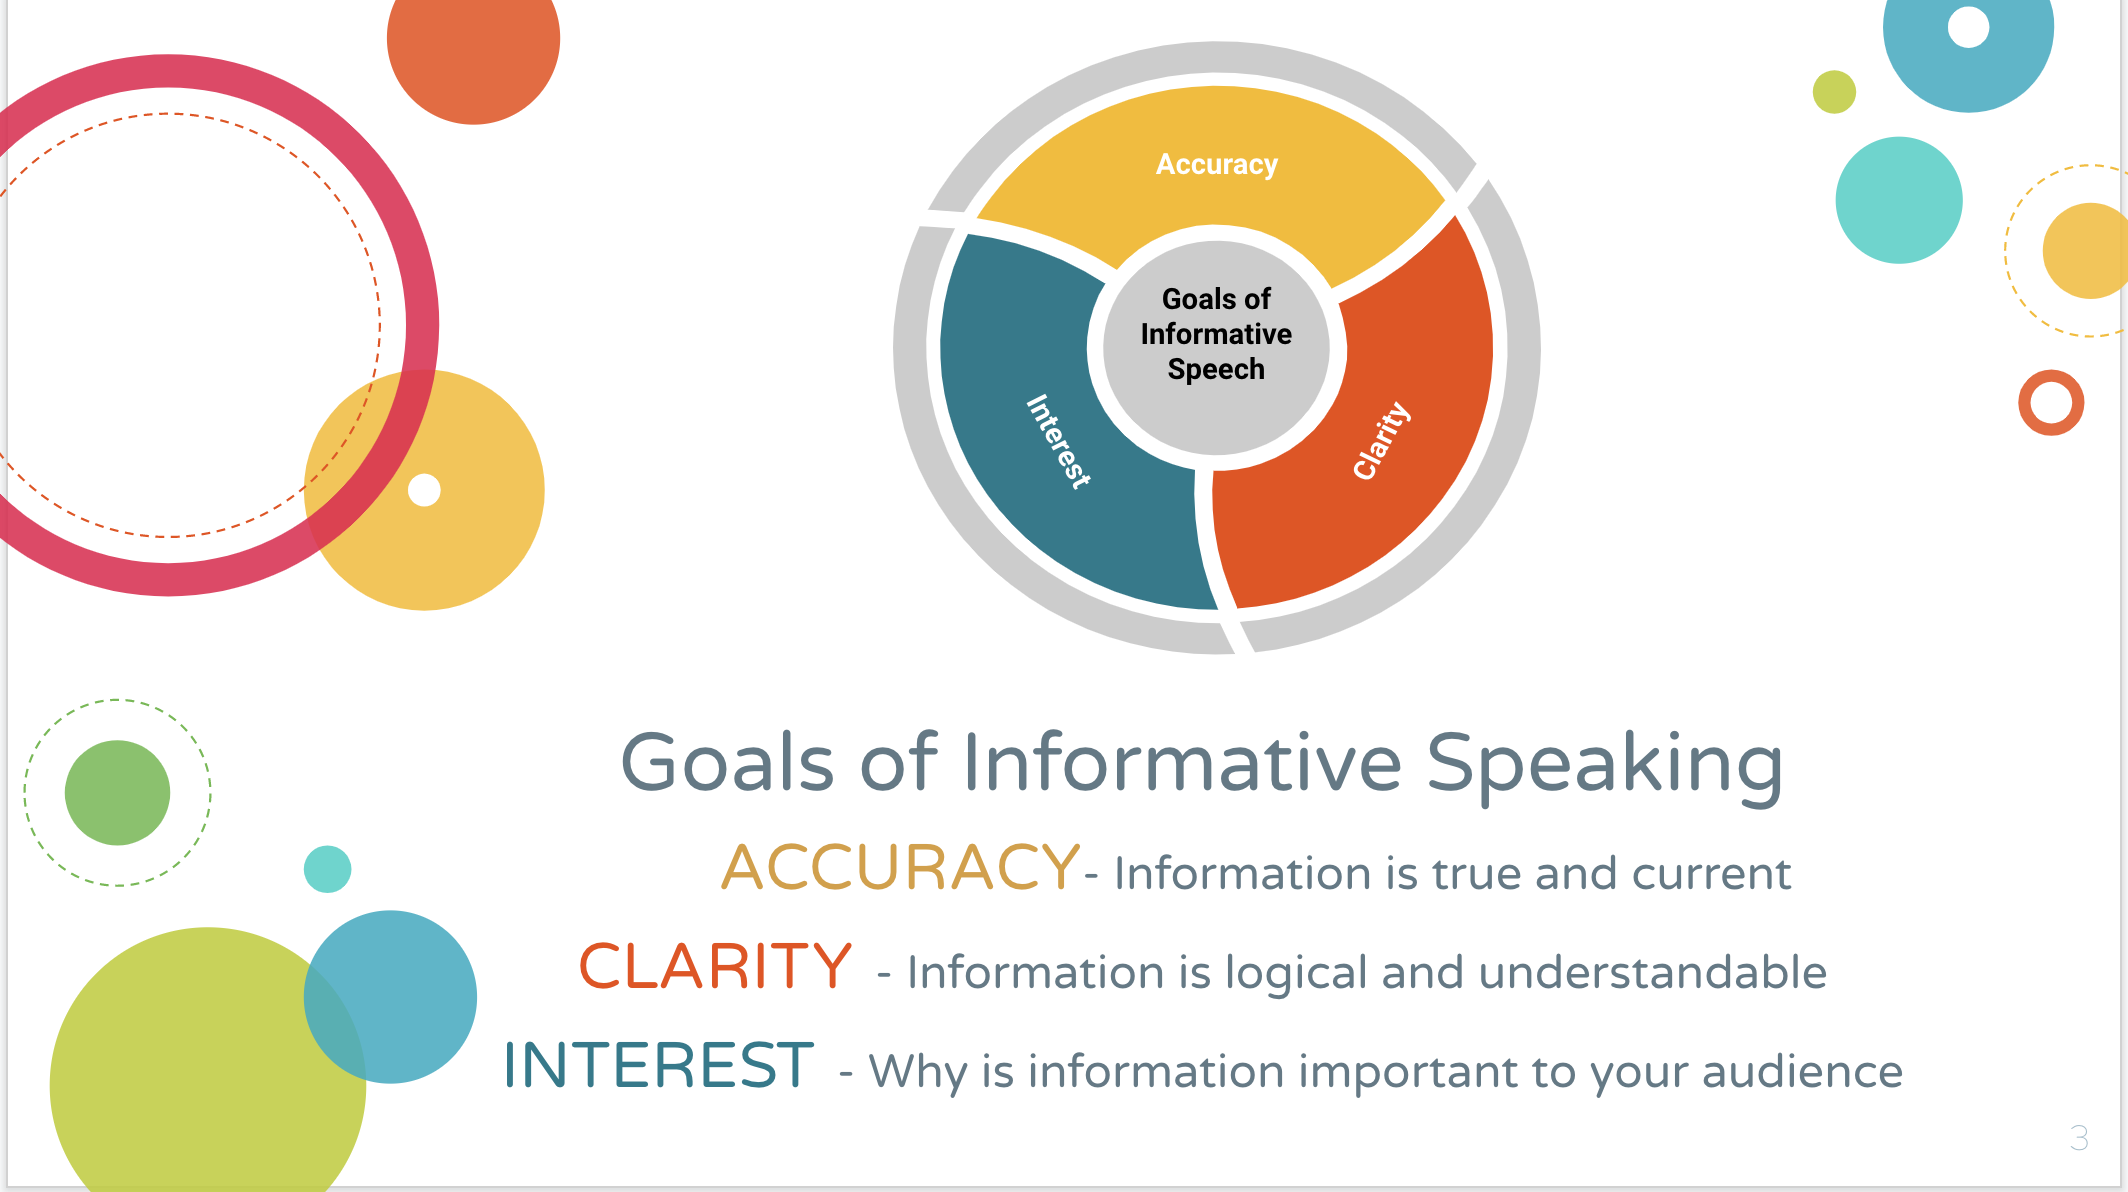 Sample Slide from Informative Speaking PowerPoint Presentation